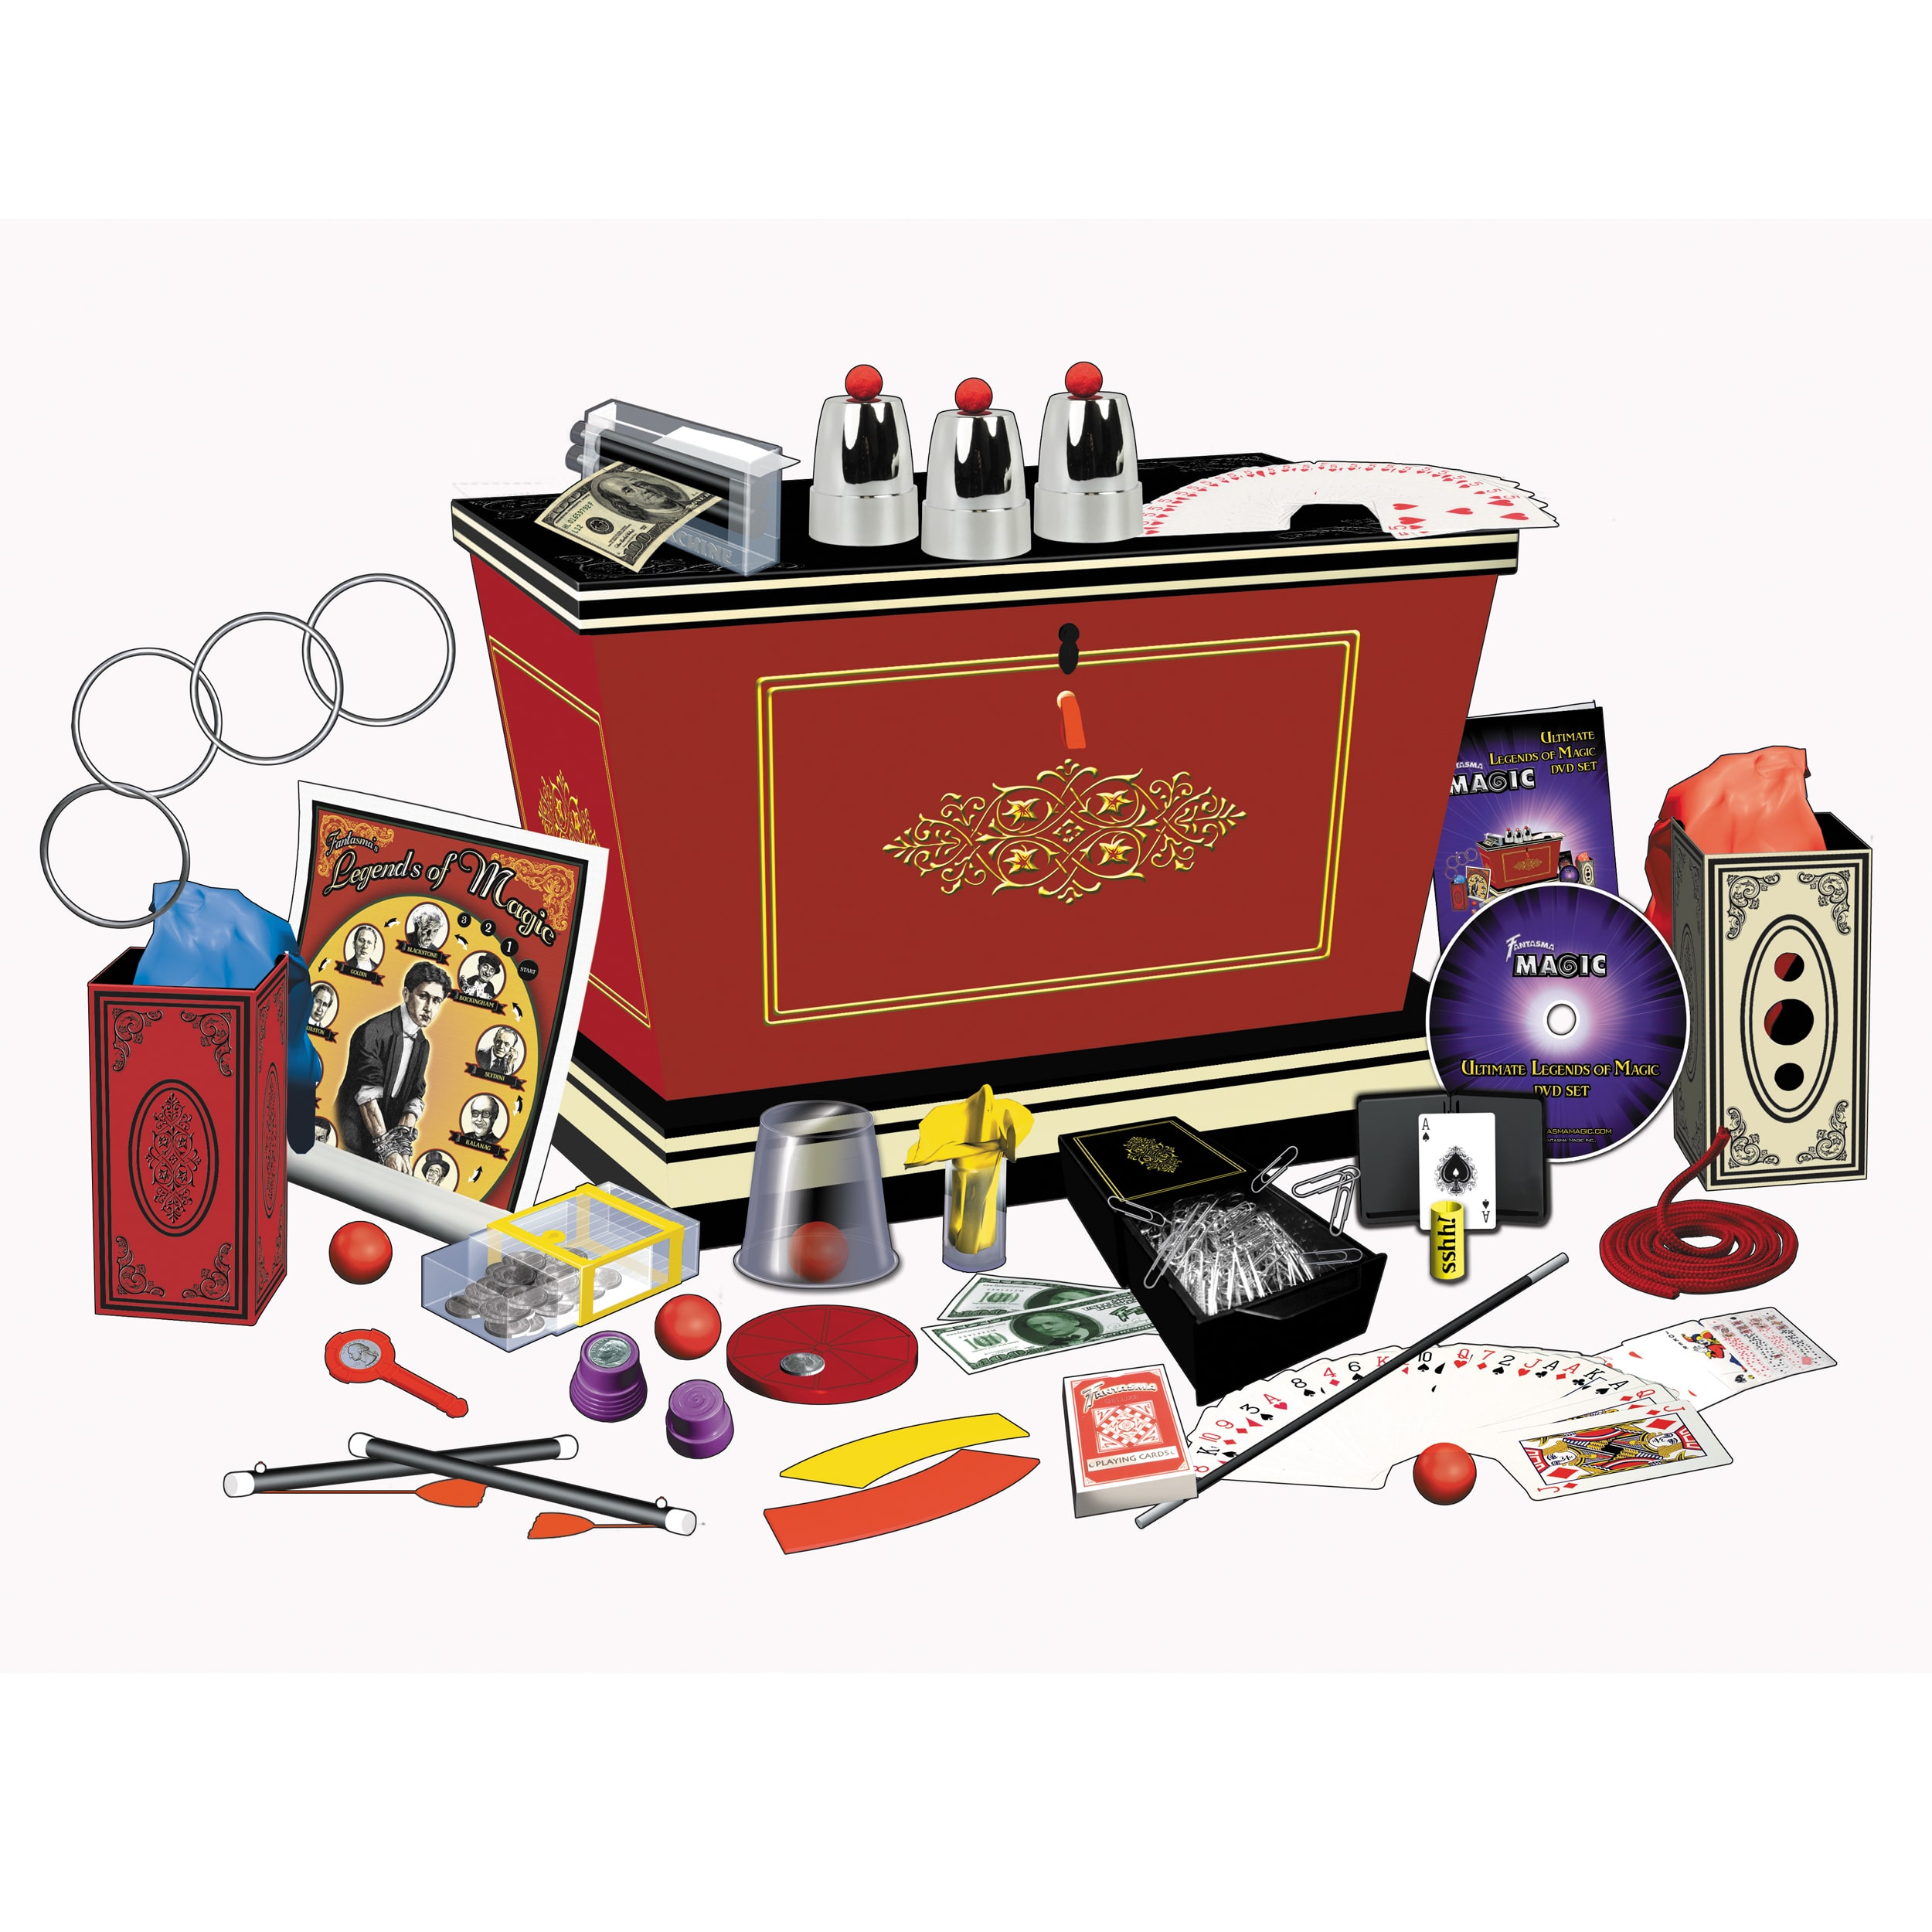 Fantasma Magic - 300 Illusions Legends of Magic Show with DVD